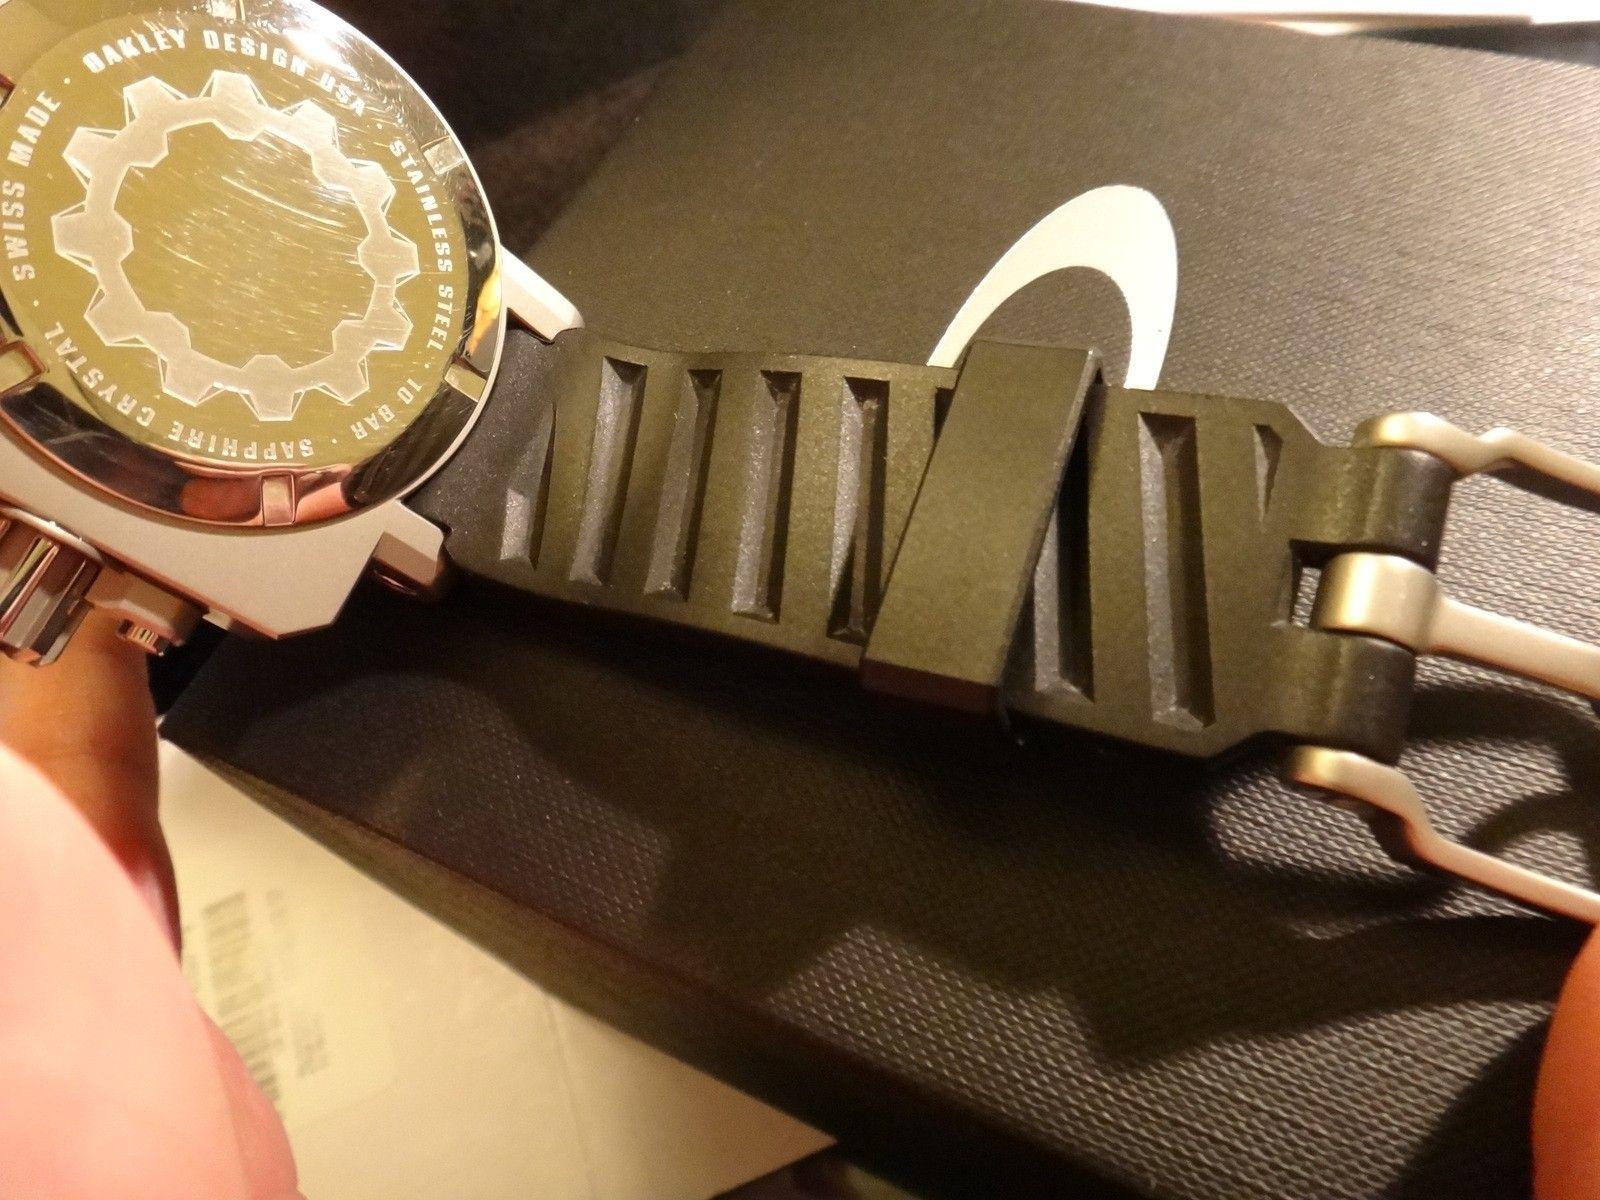 Oakley Gearbox brushed WHITE dial 10-064 stainless steel - DSC05722.JPG